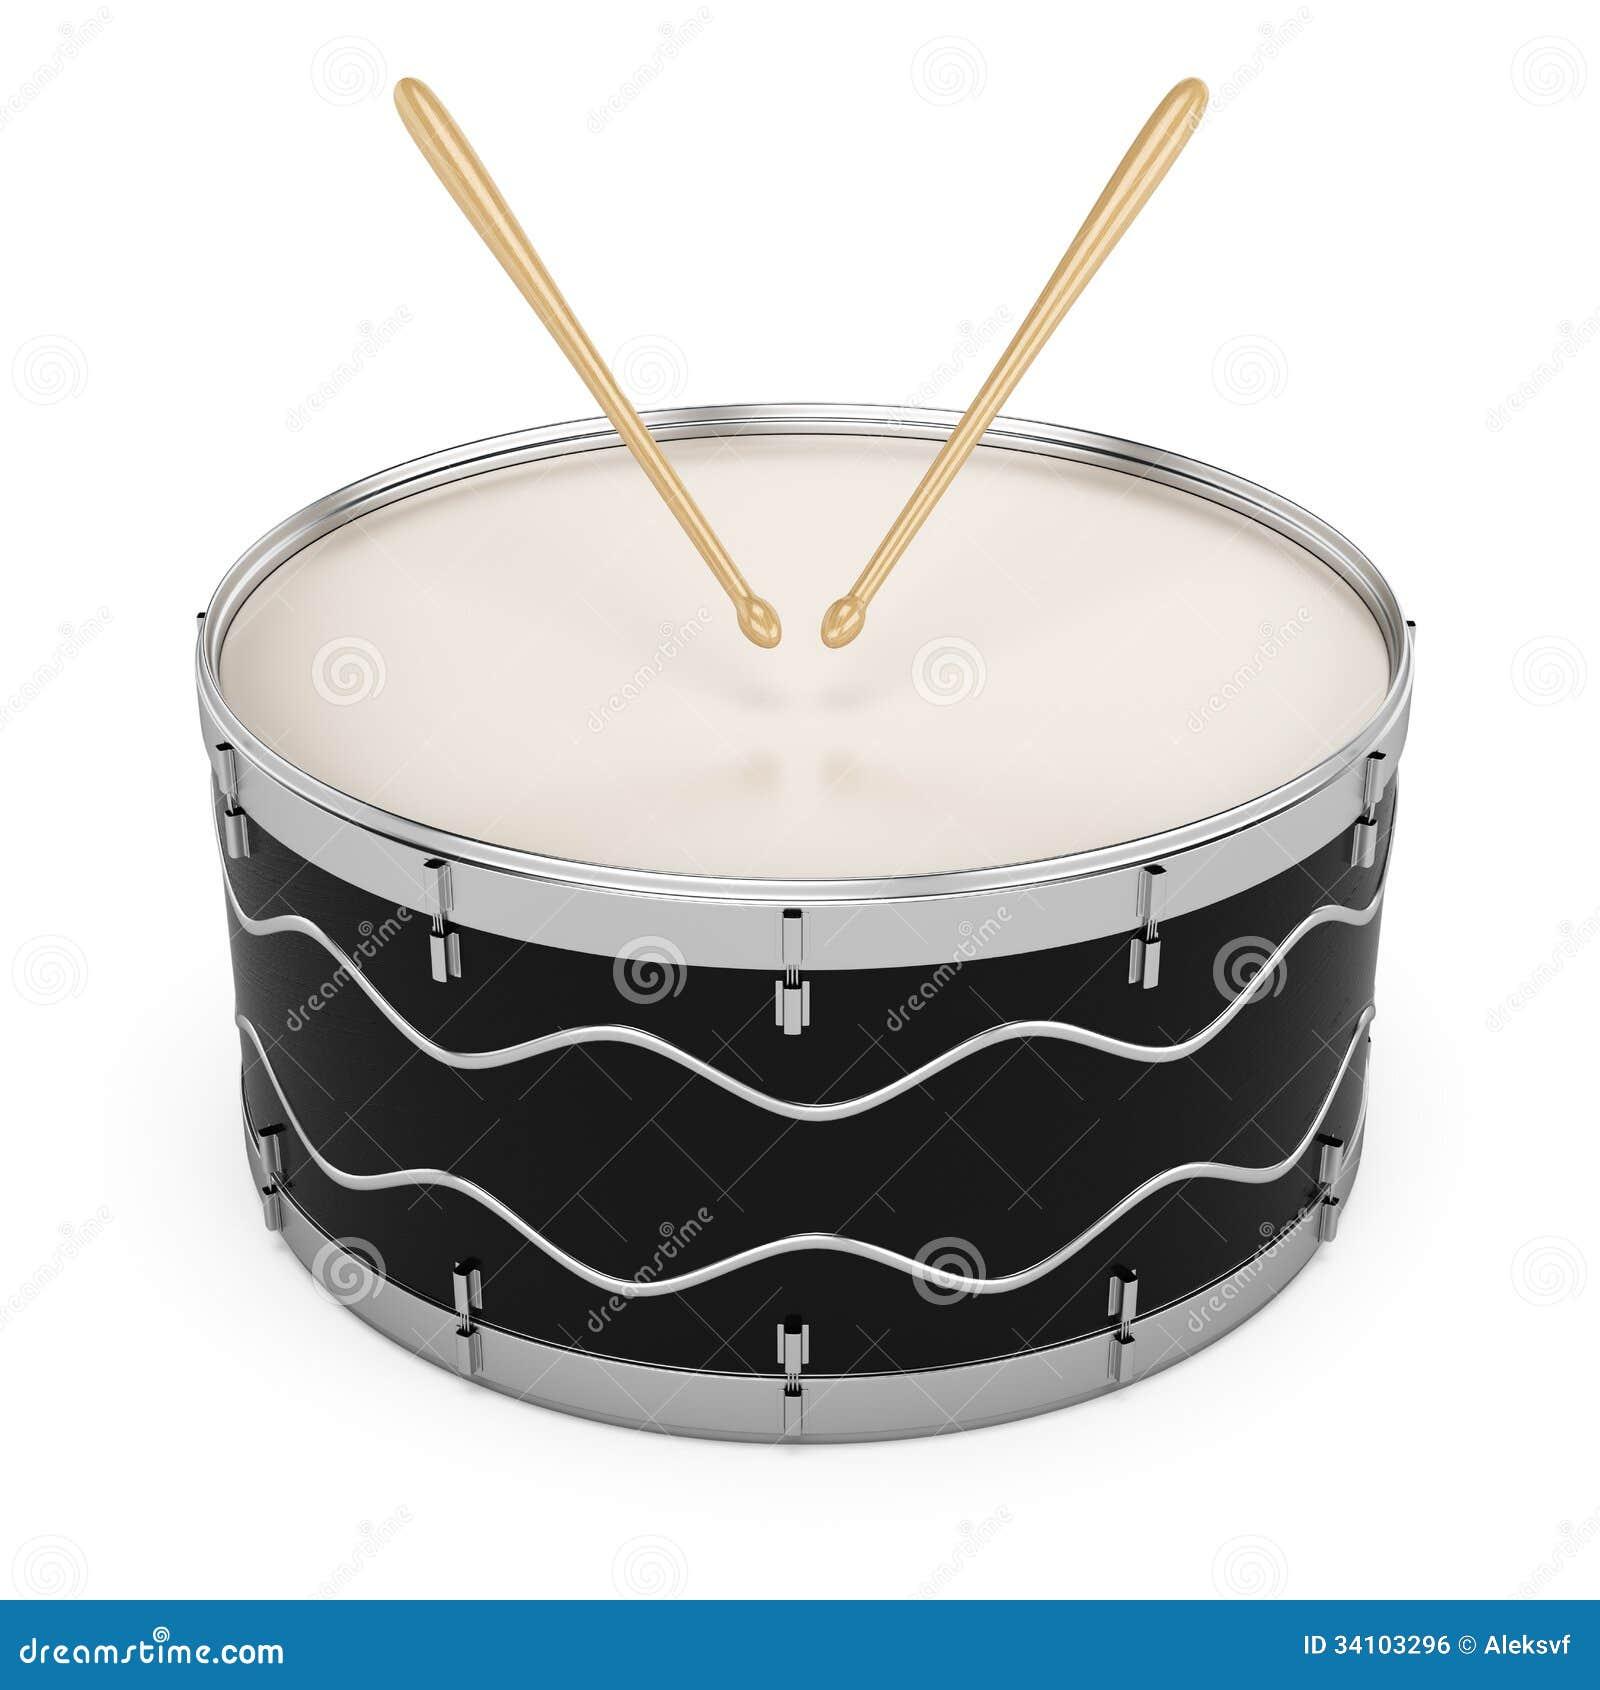 Drum Royalty Free Stock Image - Image: 34103296